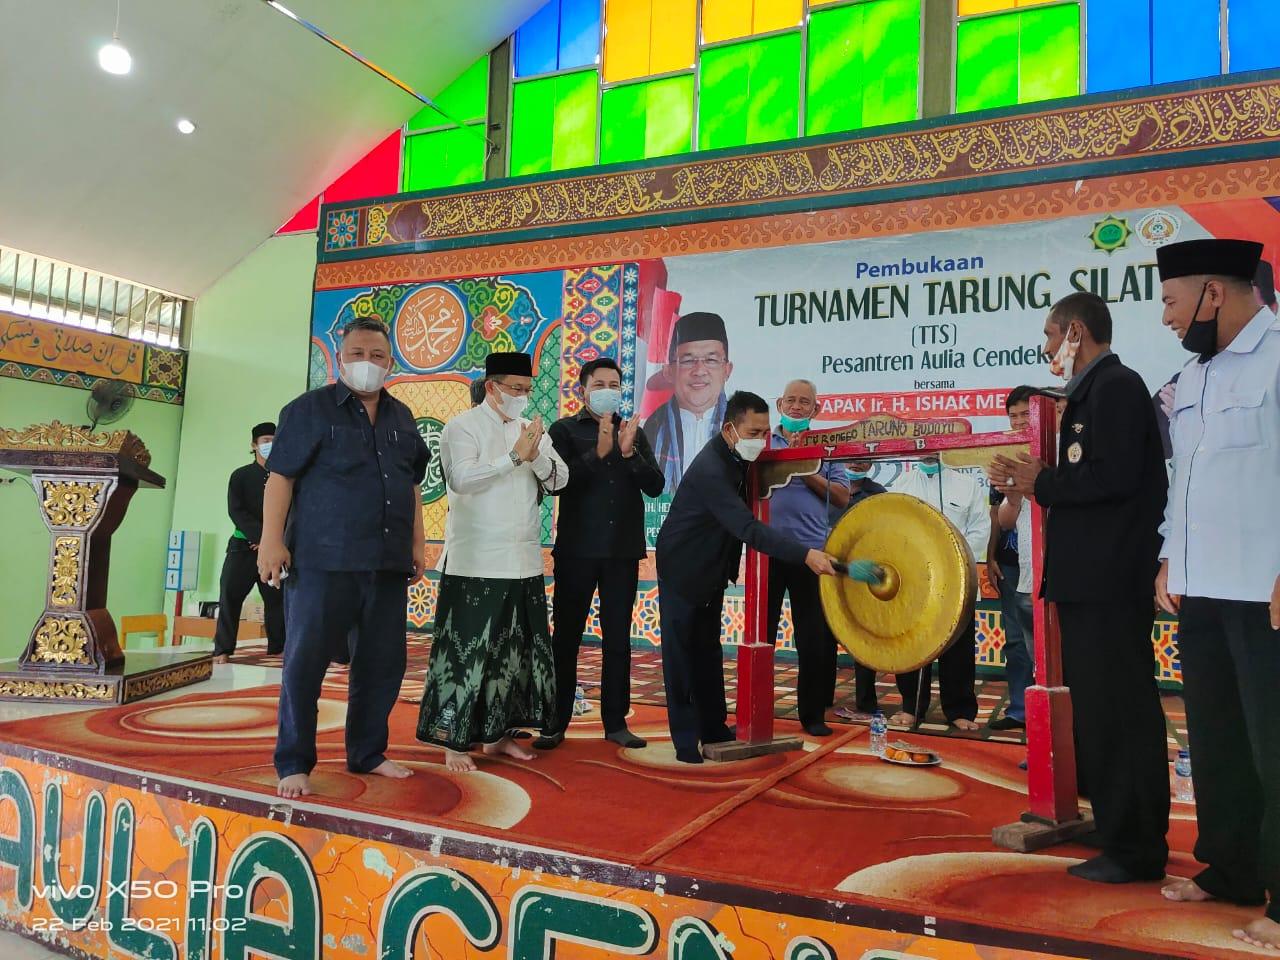 Ponpes Aulia Cendekia Kembali Gelar Turnamen Tarung Silat